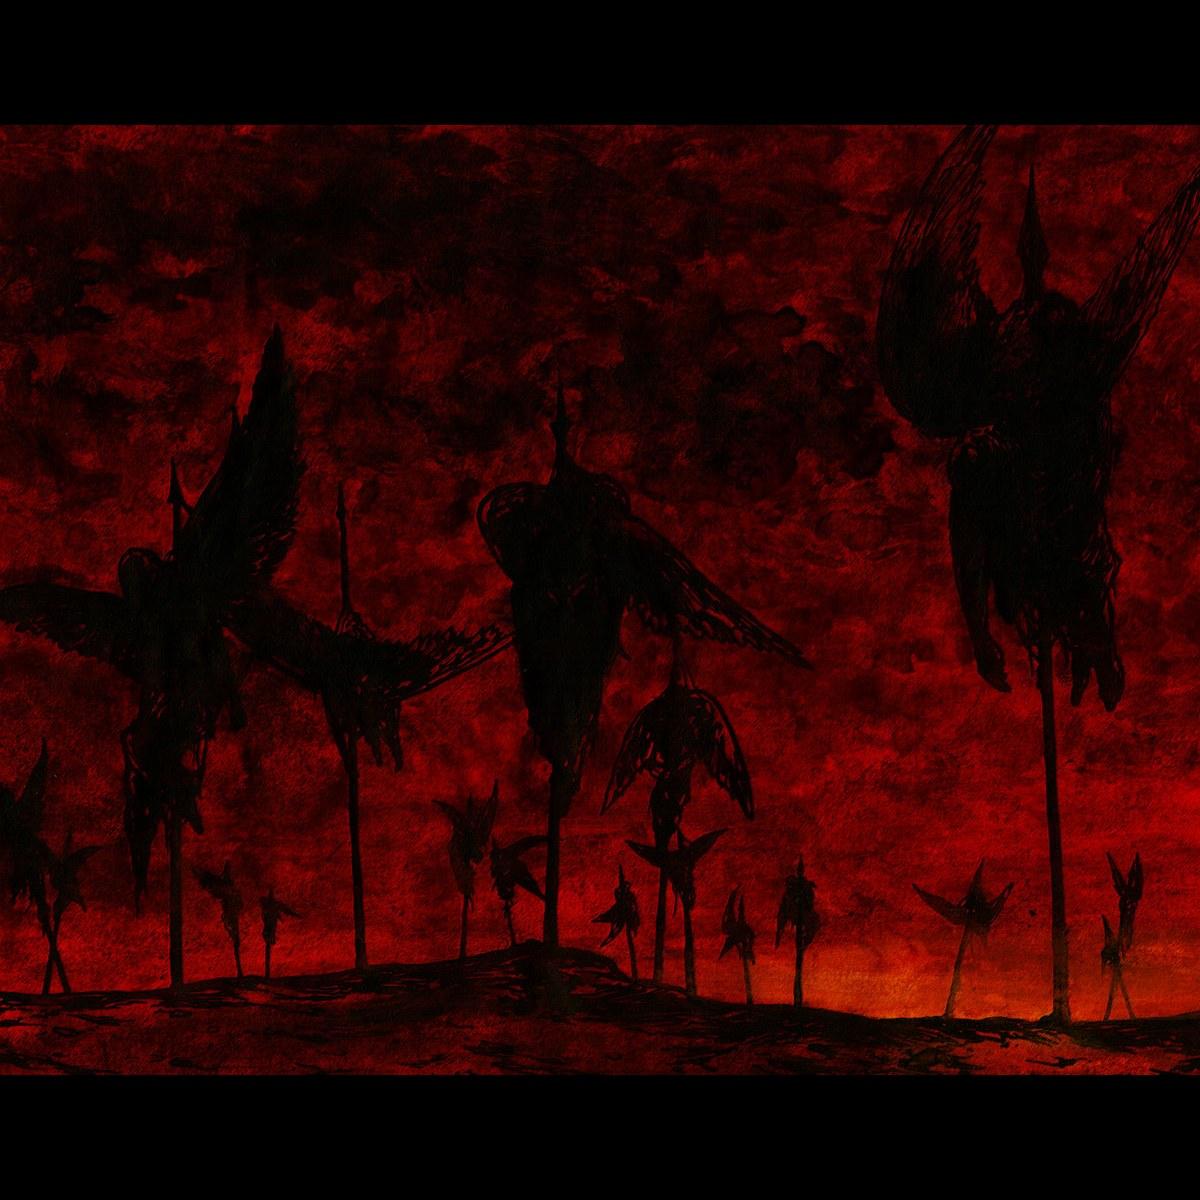 Reviews for The Obsidian Satanic Salt - Чёрный поток семени ада